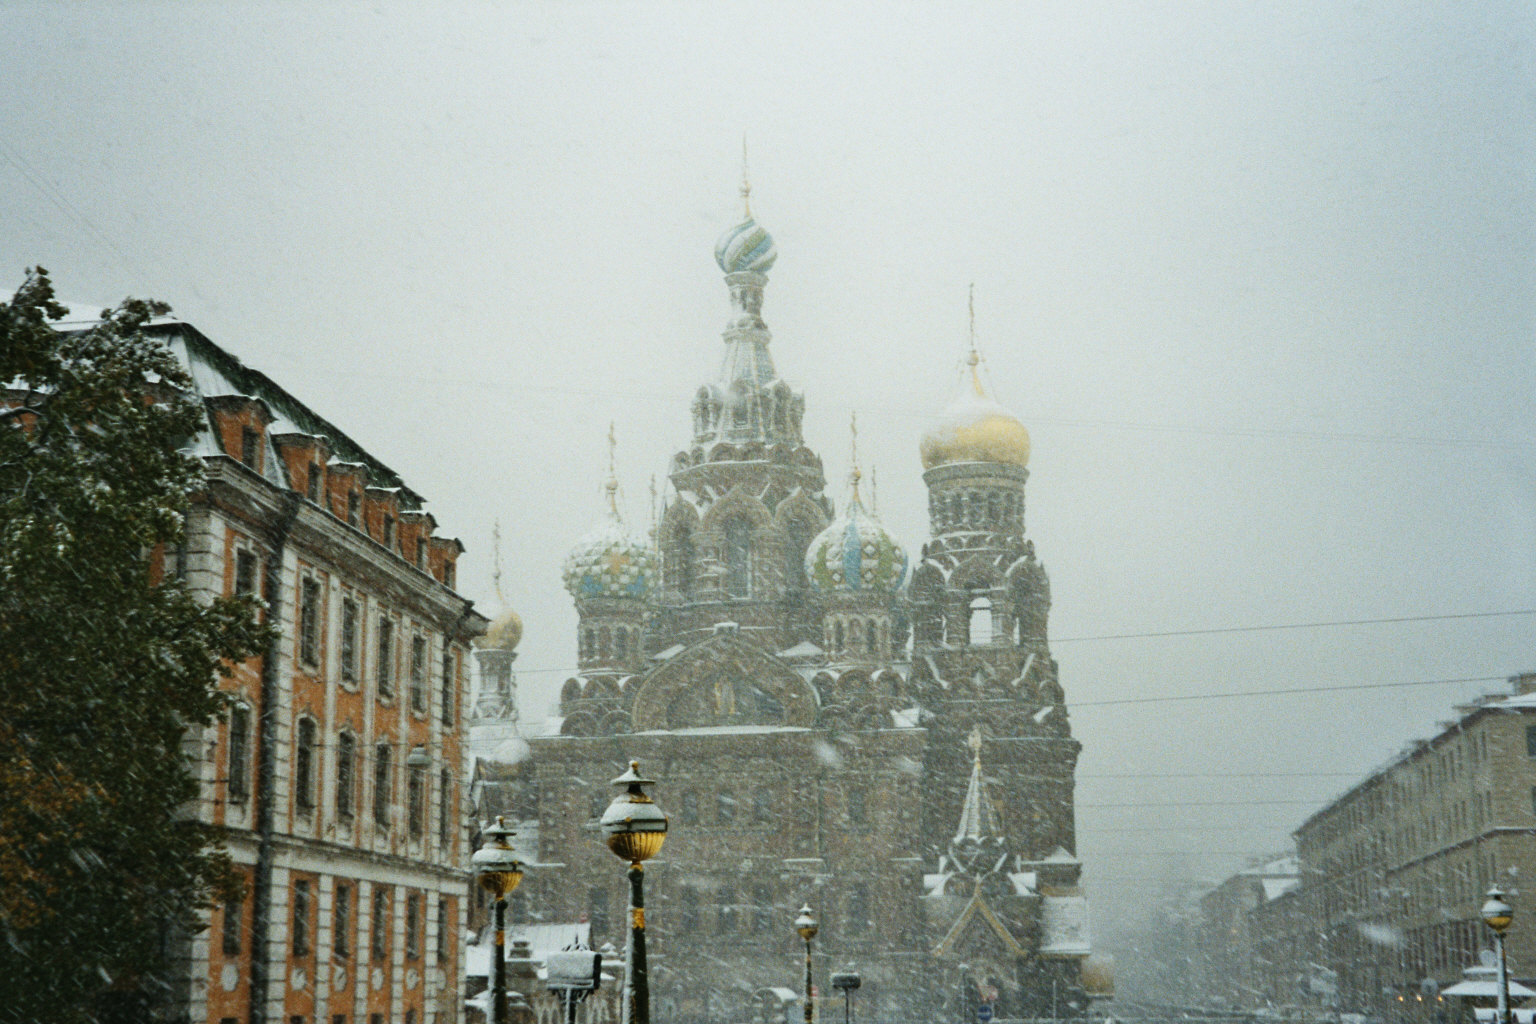 Svetlanovsky avenue in St. Petersburg: the history of the street in the history of the city